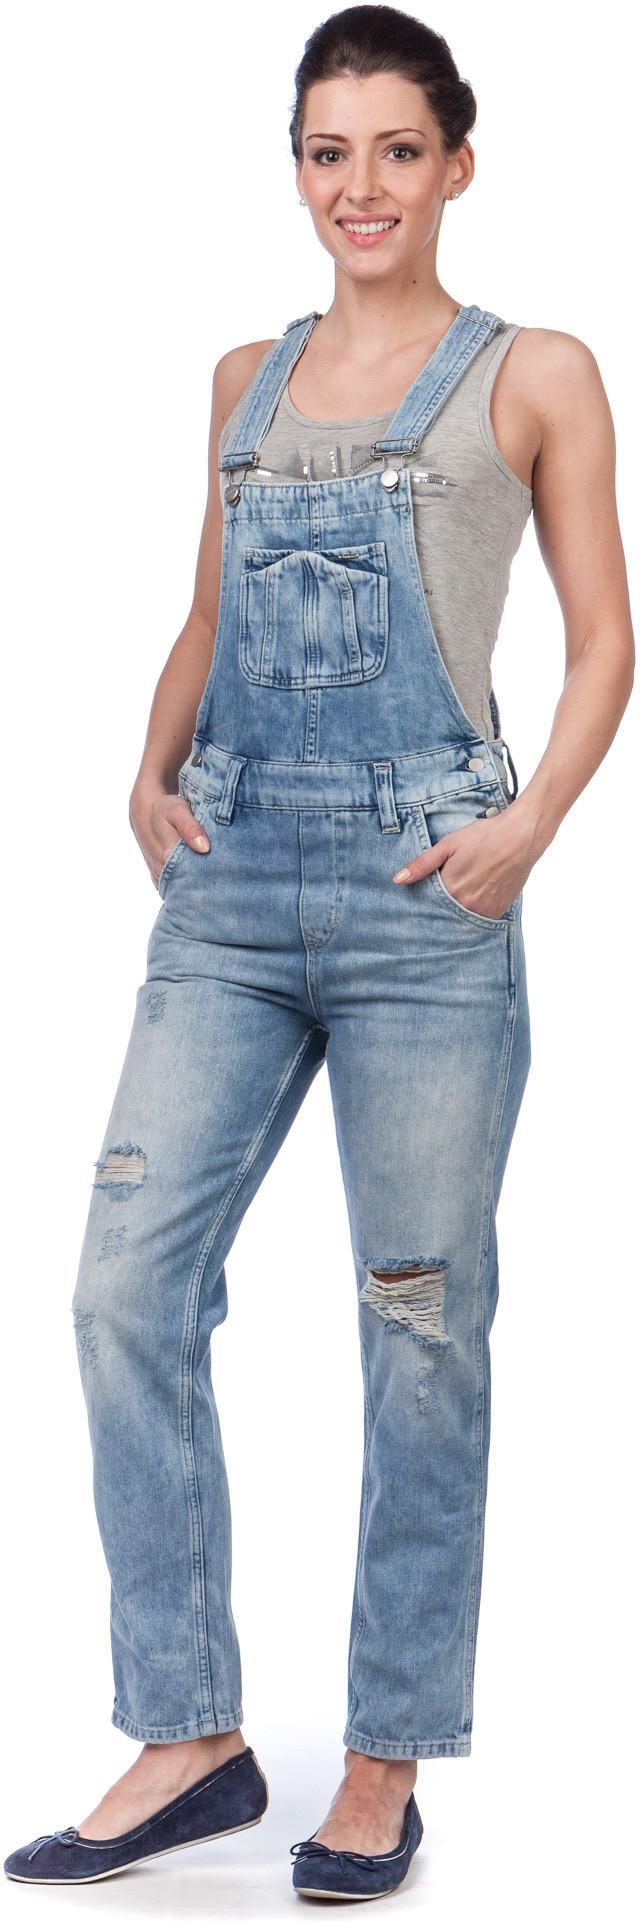 Pepe Jeans kombinezon damski Nomad S niebieski